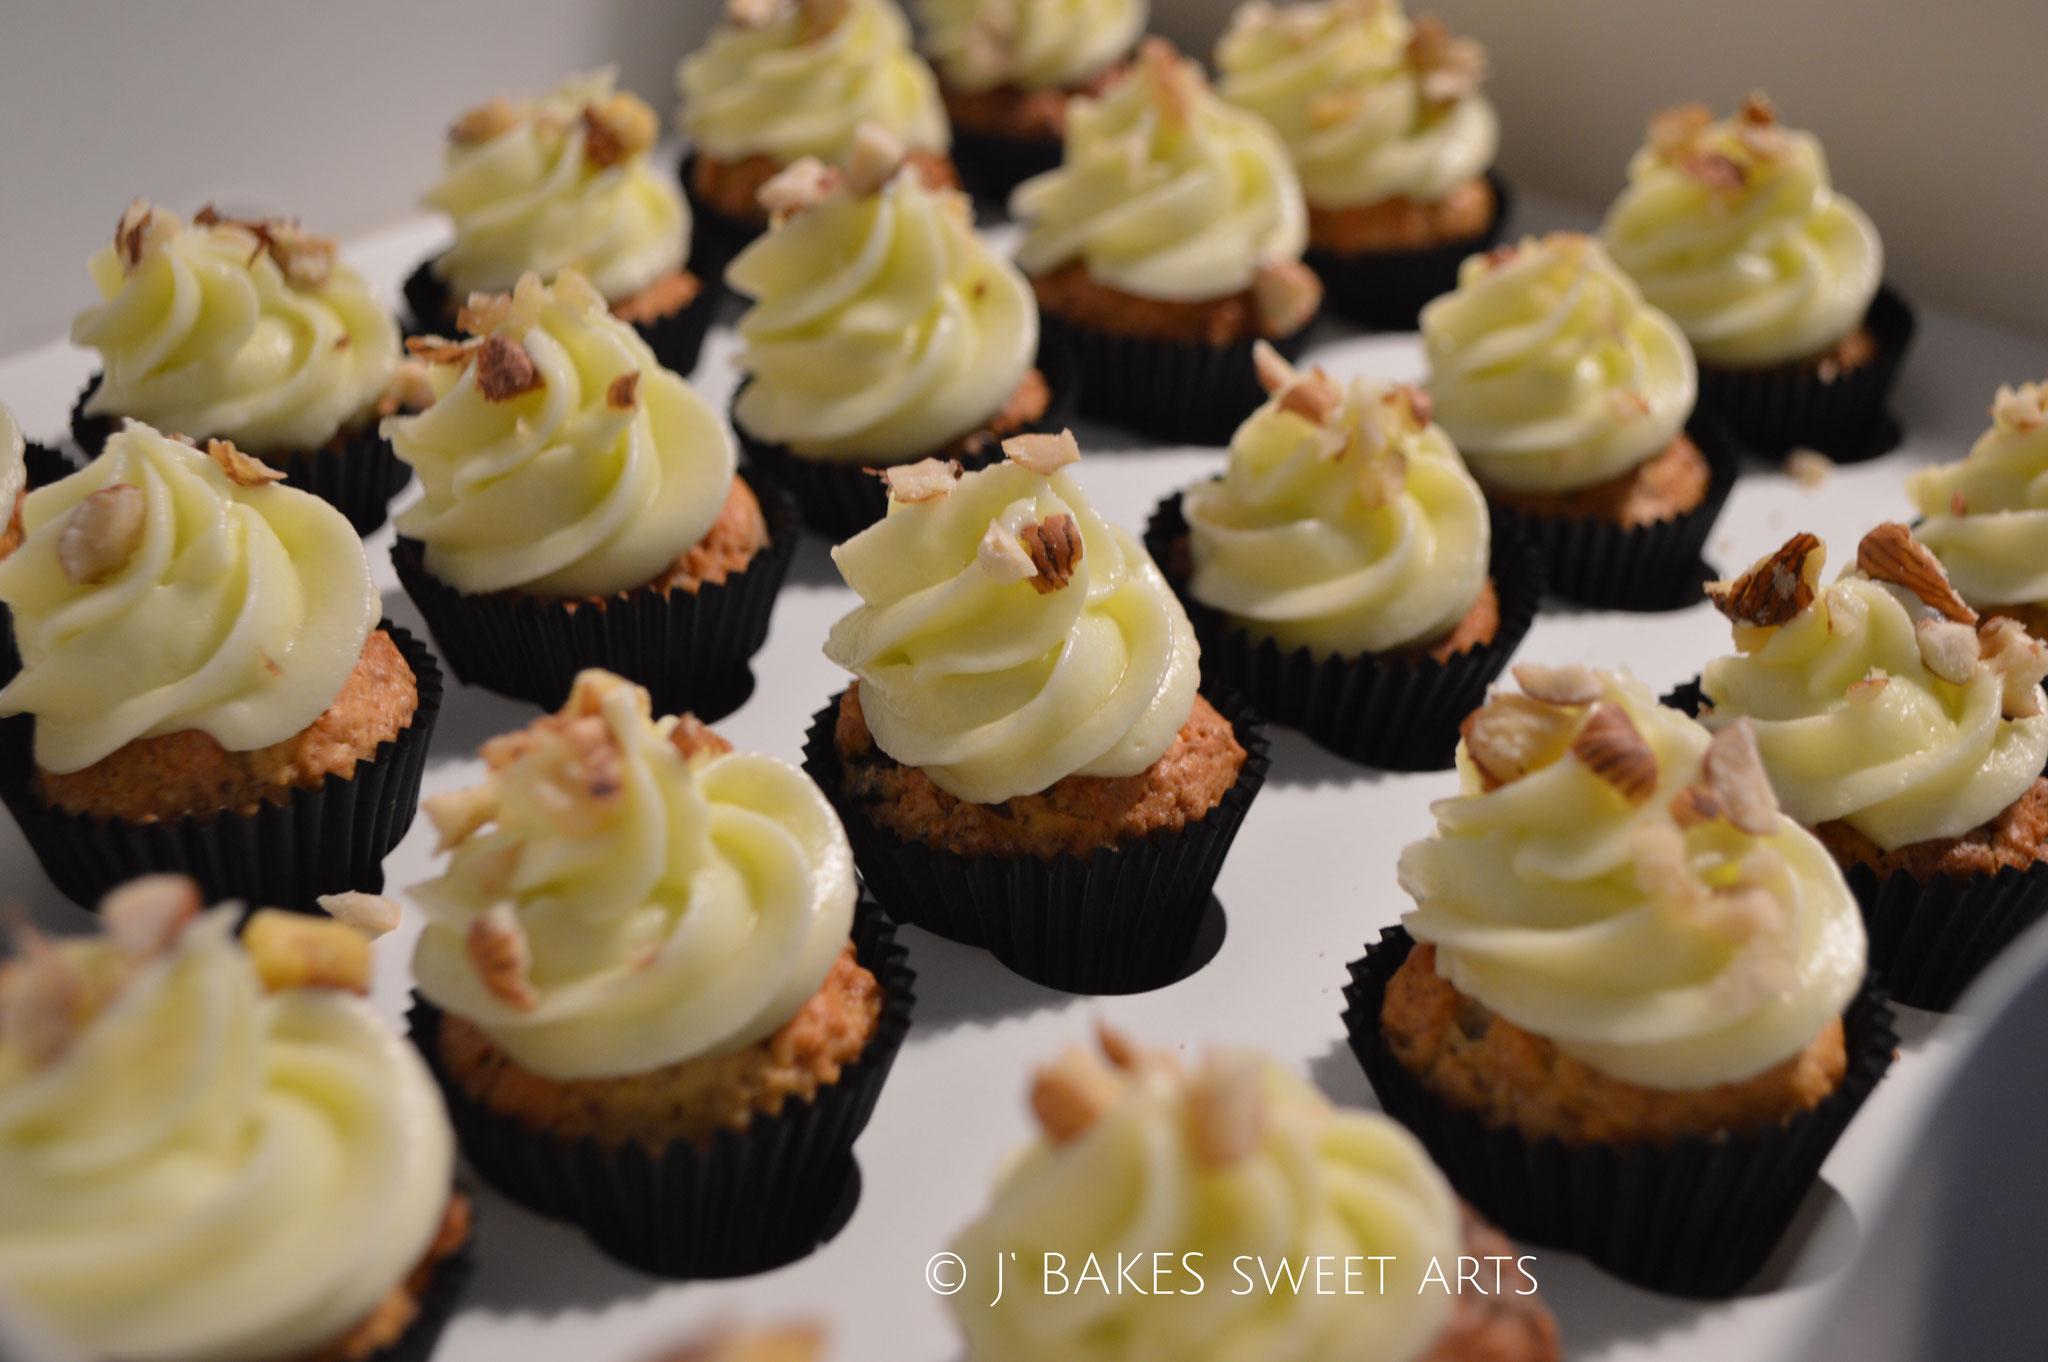 Hazelnut-Chocolate-Mini-Cupcakes // Haselnuss-Schokoladen-Mini-Cupcakes